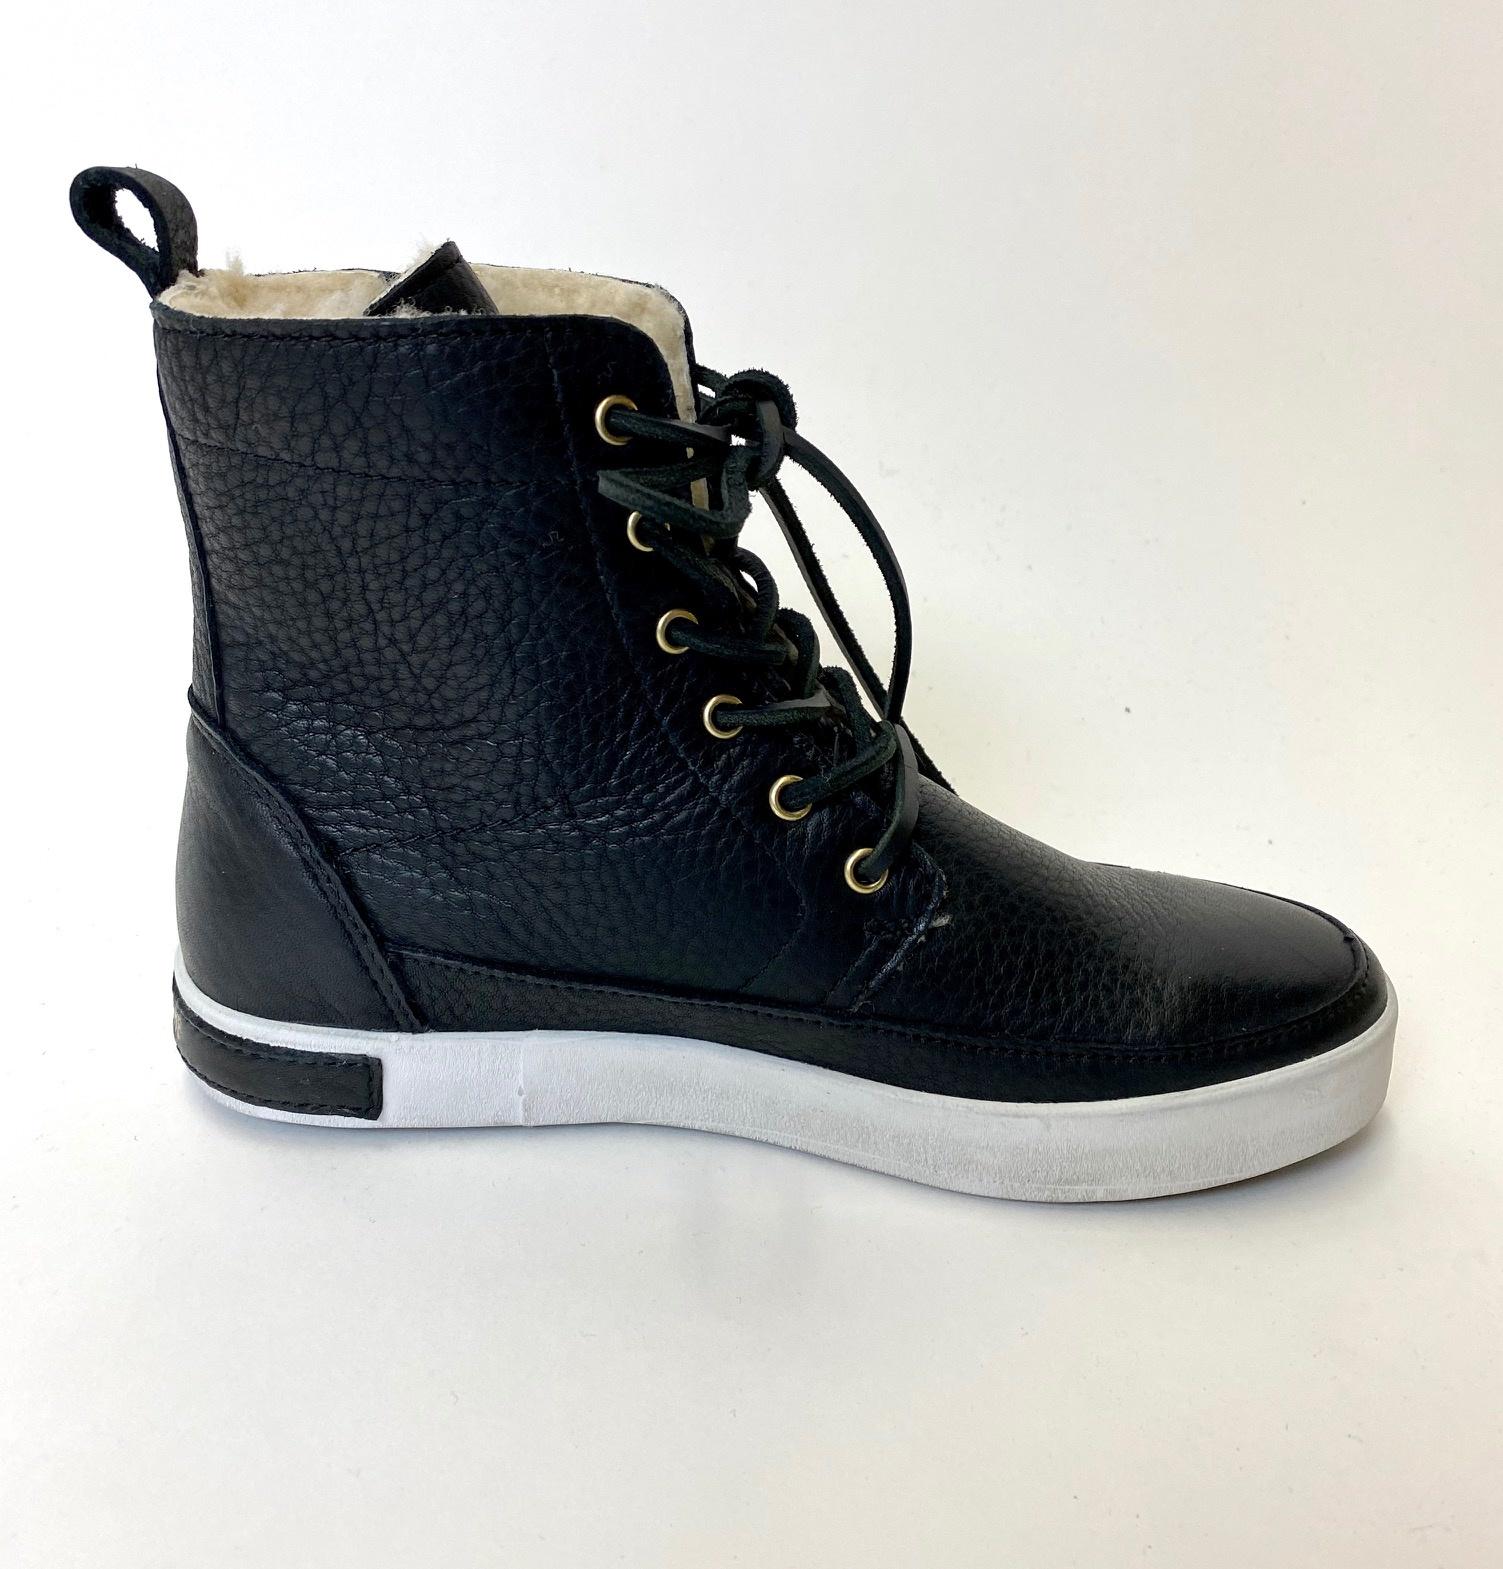 Blackstone Blackstone Blk Leather Lace Up Boot CW96Q45-001